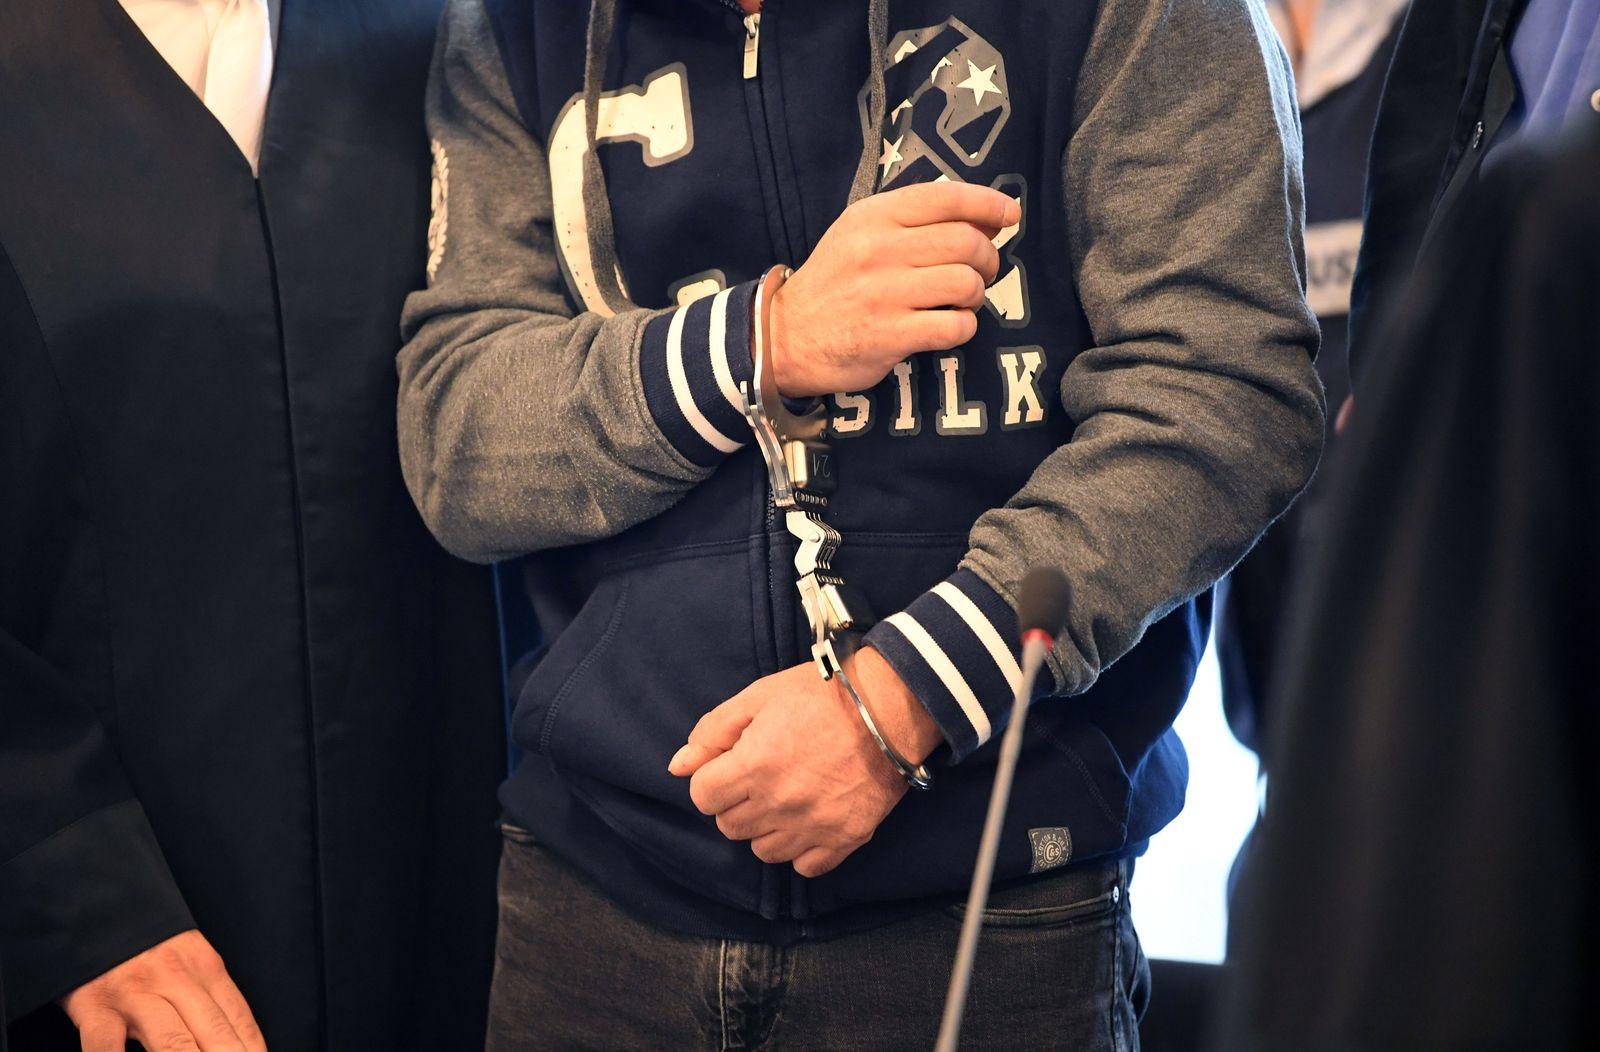 Beginn Mafia-Prozess in Karlsruhe